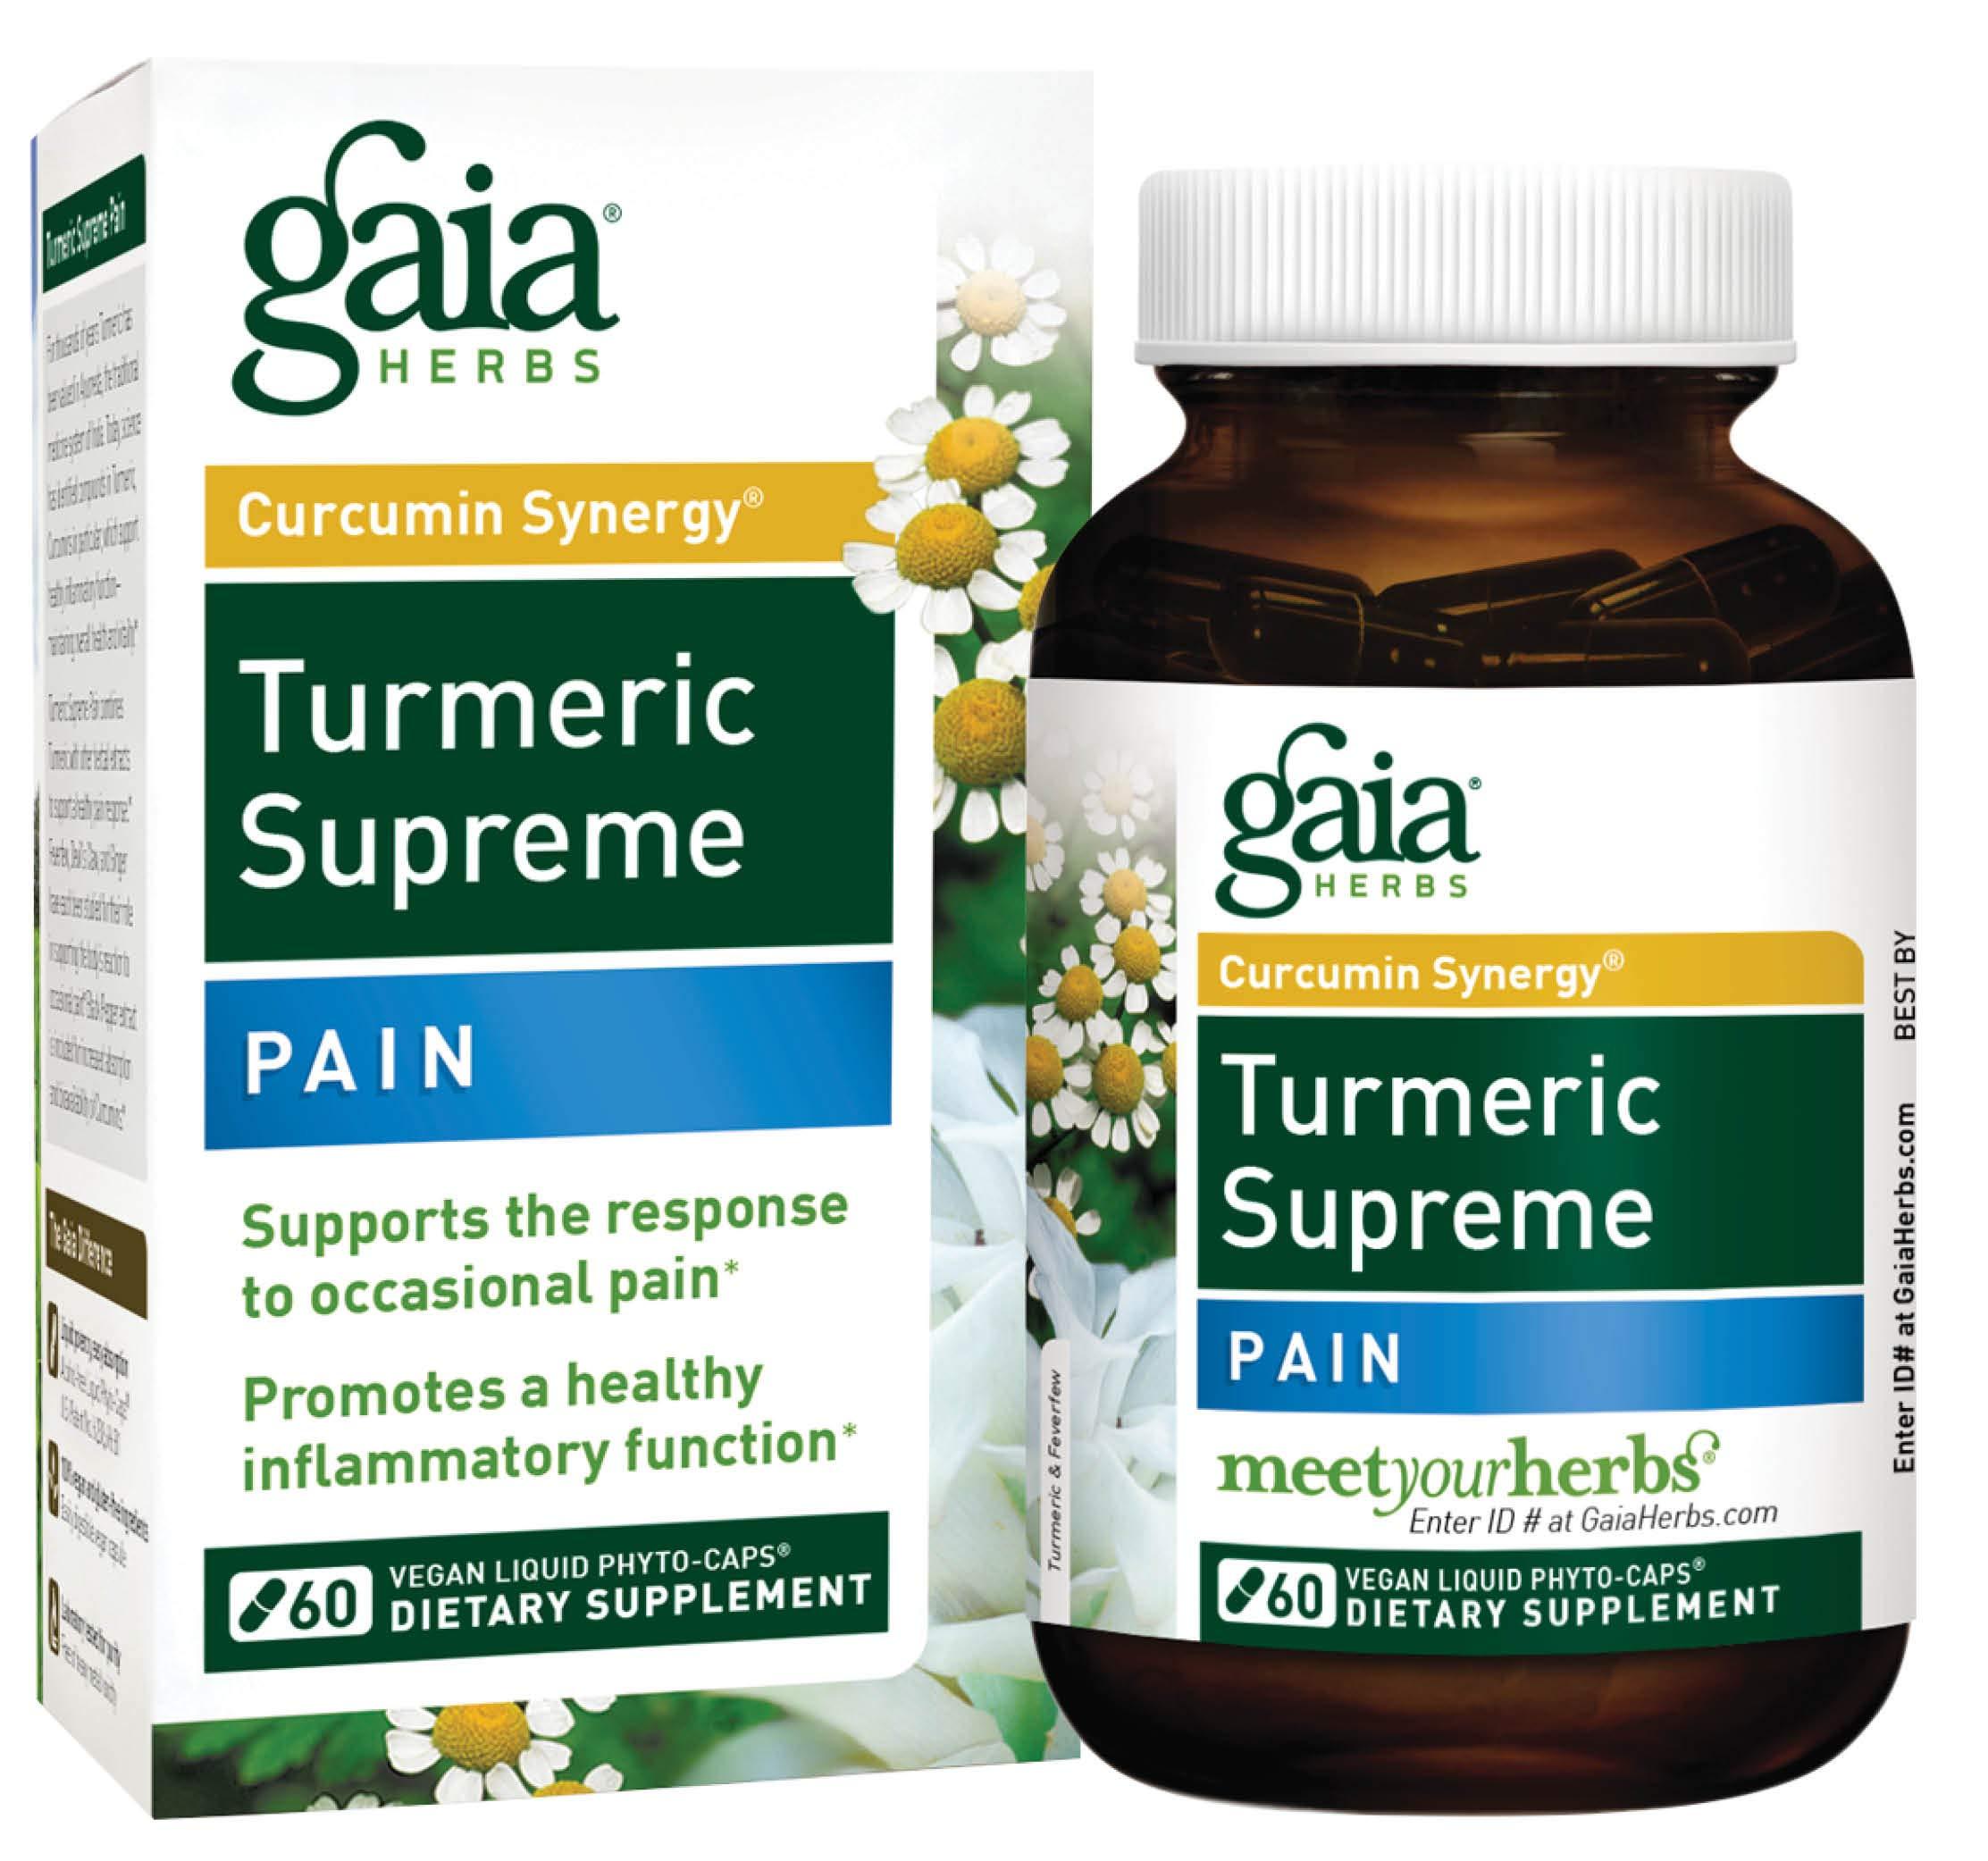 Gaia Herbs, Turmeric Supreme Pain, Herbal Pain Supplement with Curcumins, Vegan Liquid Capsules, 60 Count